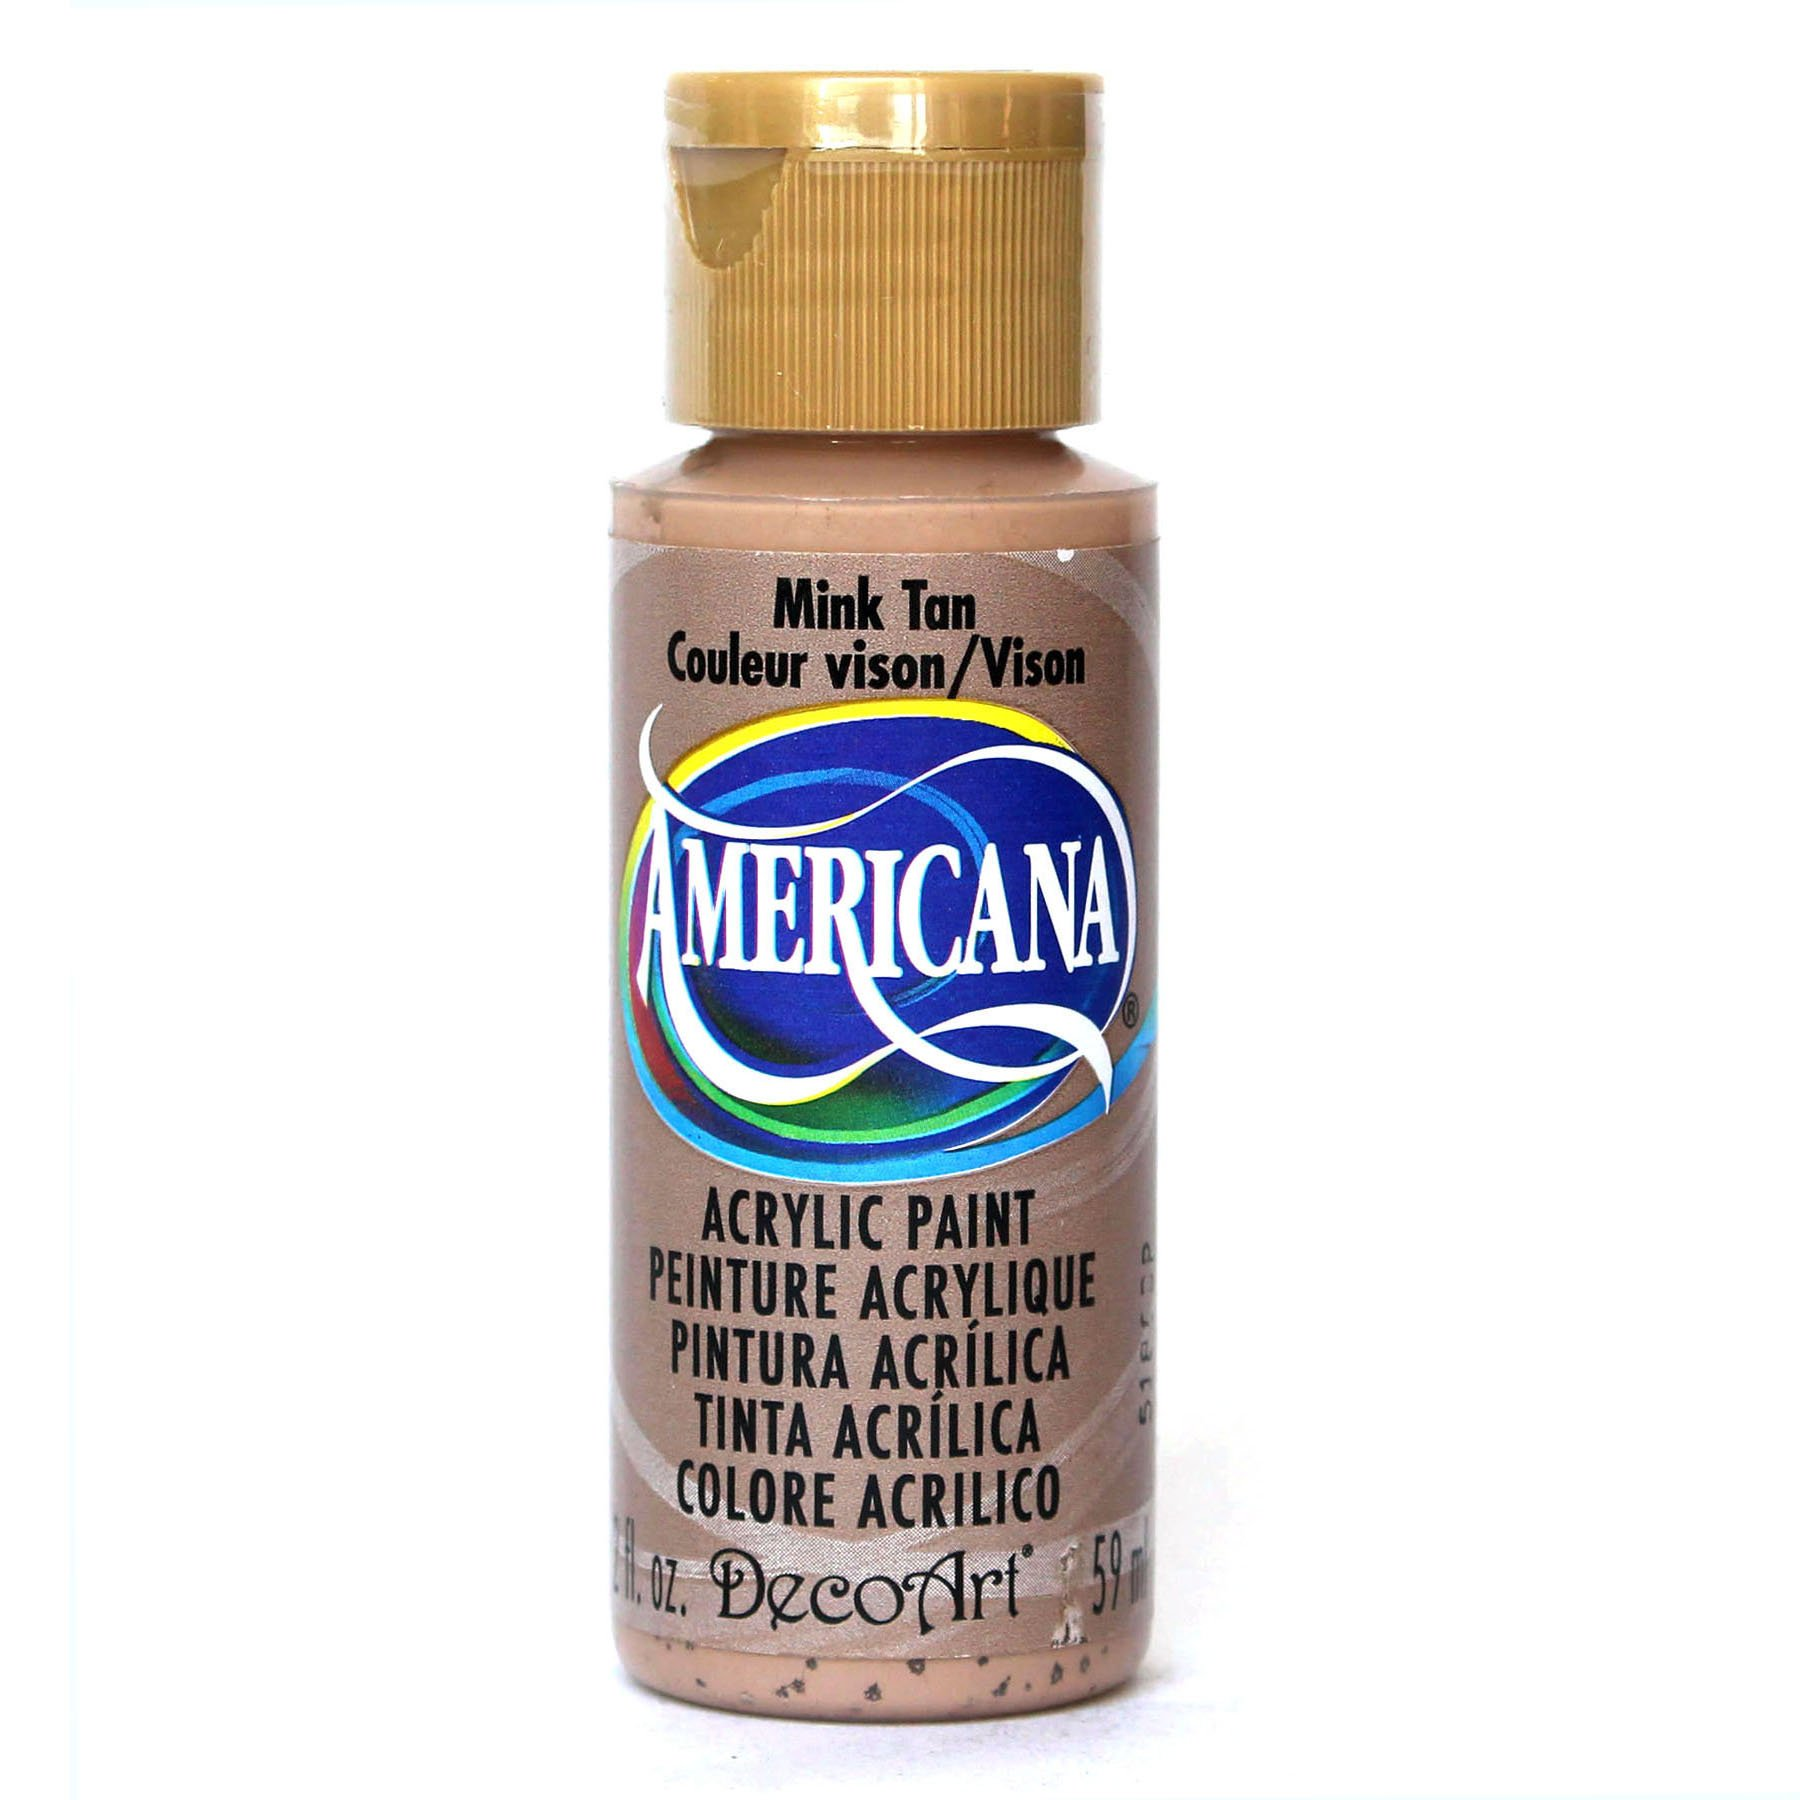 DecoArt Americana Acrylic Paint, 2-Ounce, Mink Tan